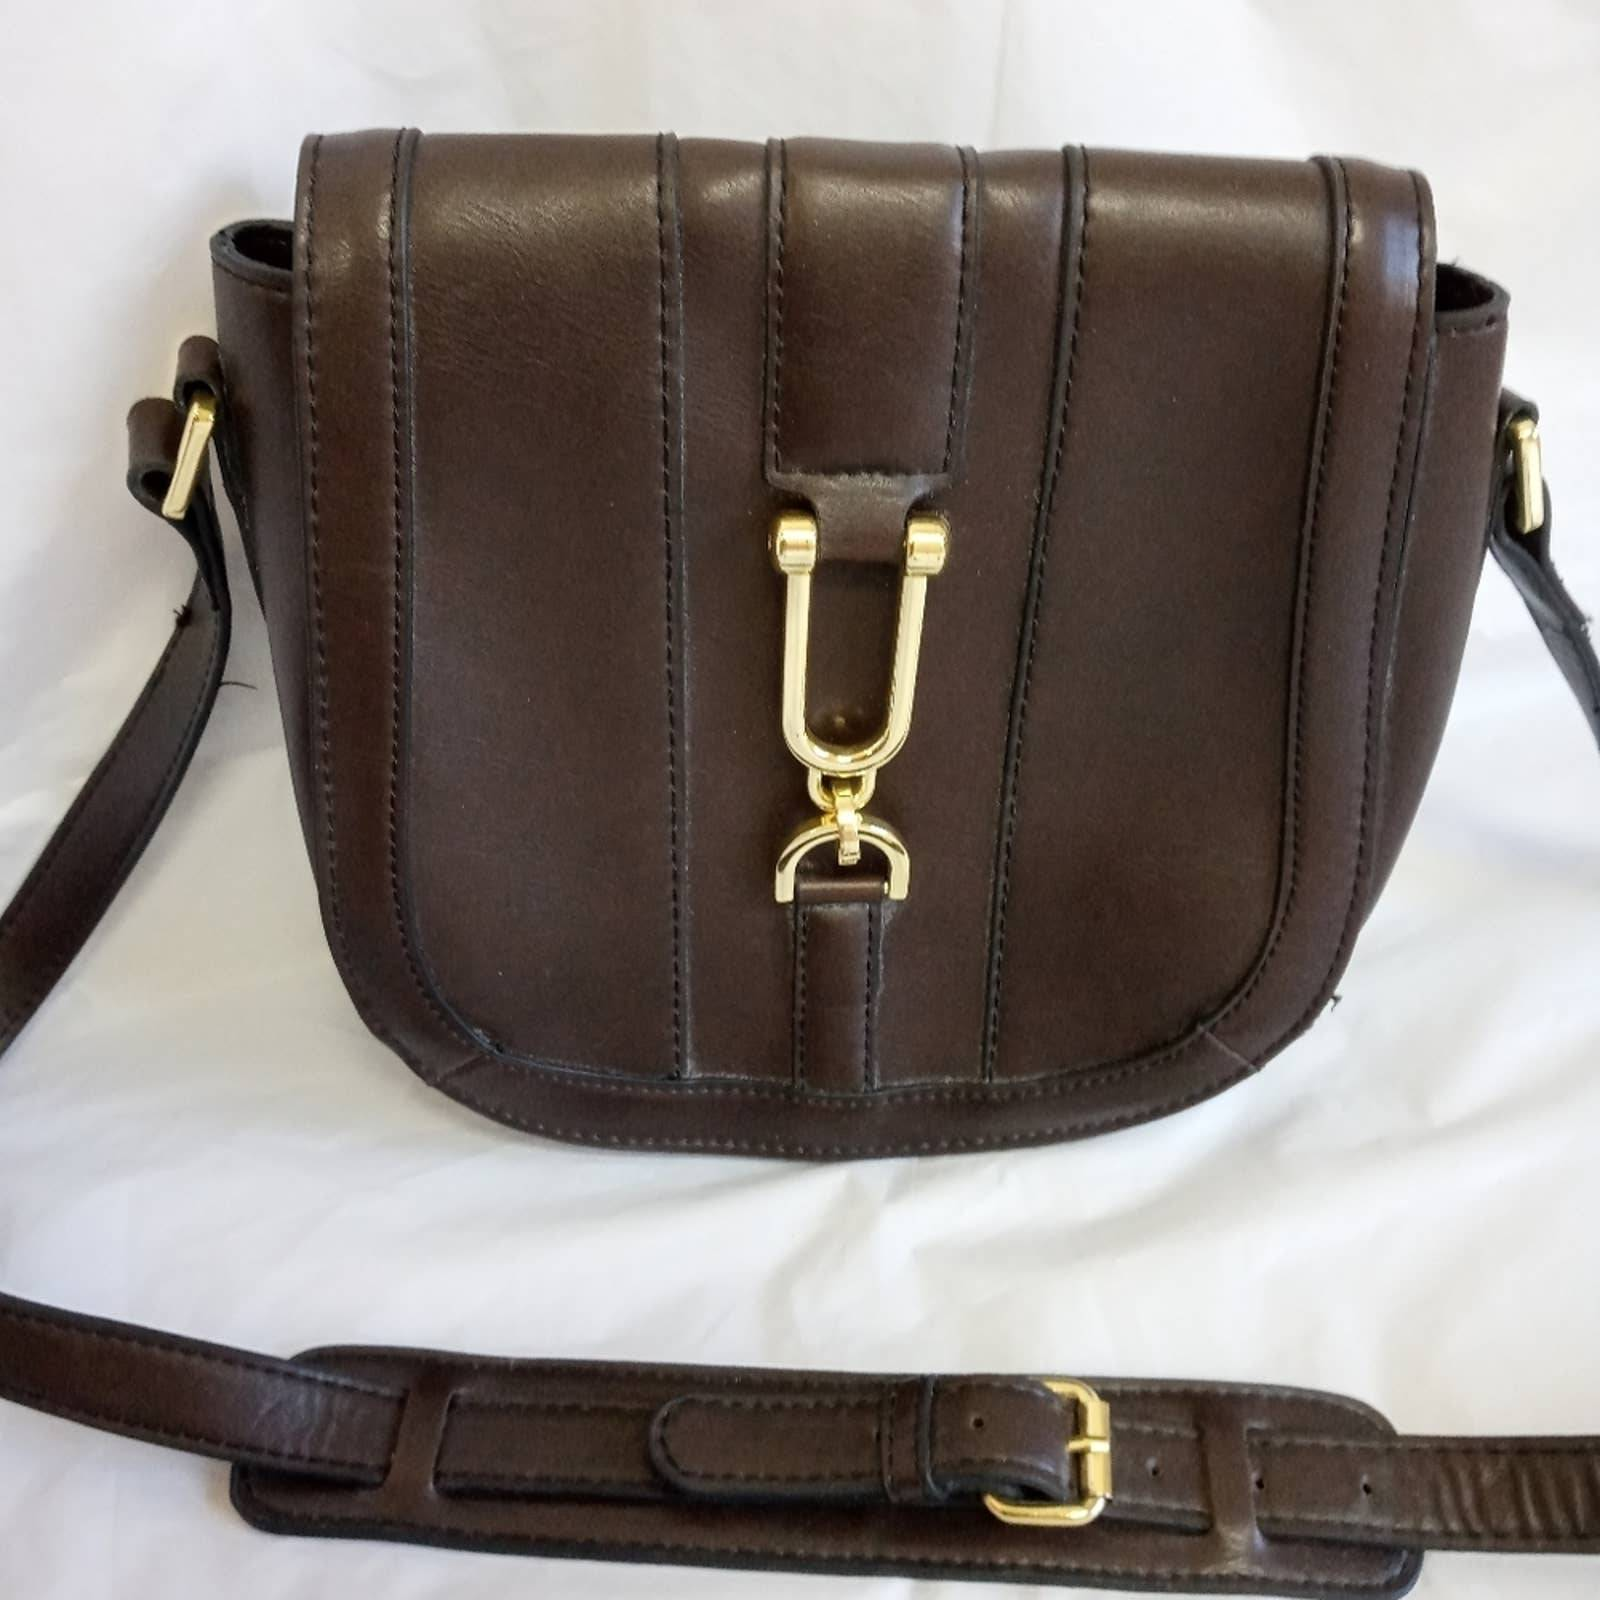 London Fog Saddle Dora Brown leather bag